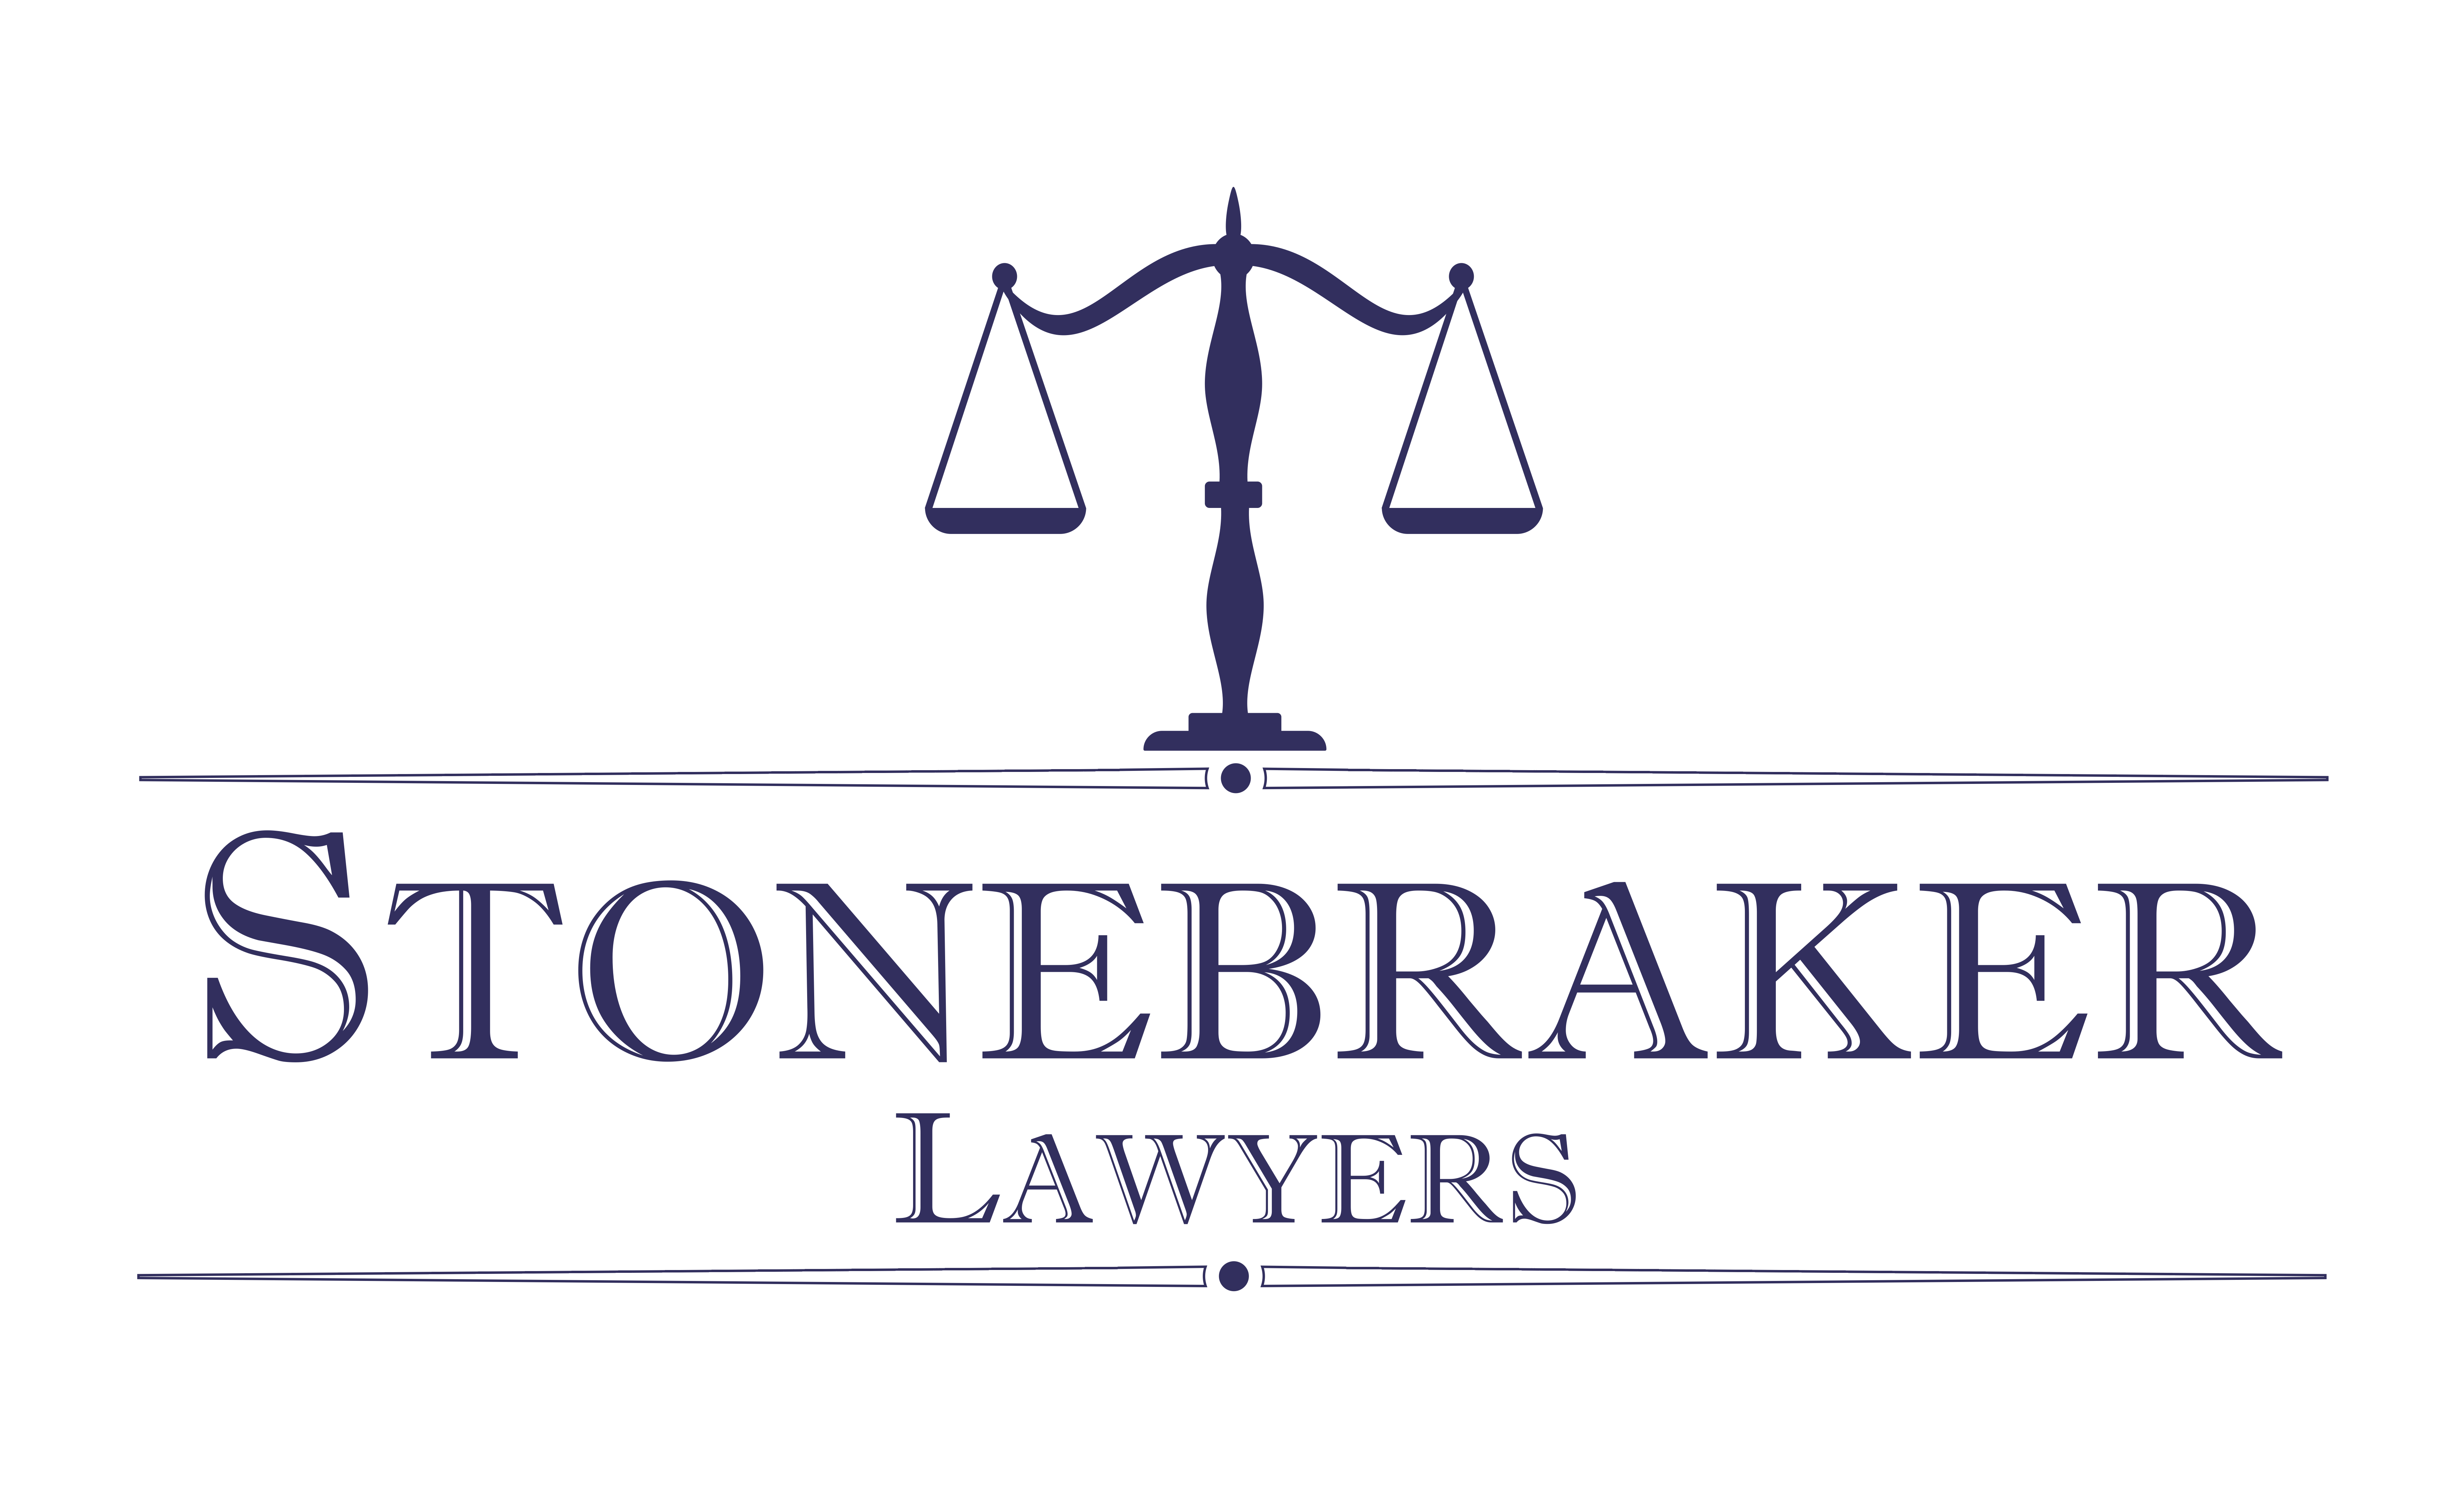 Stonebraker Lawyers